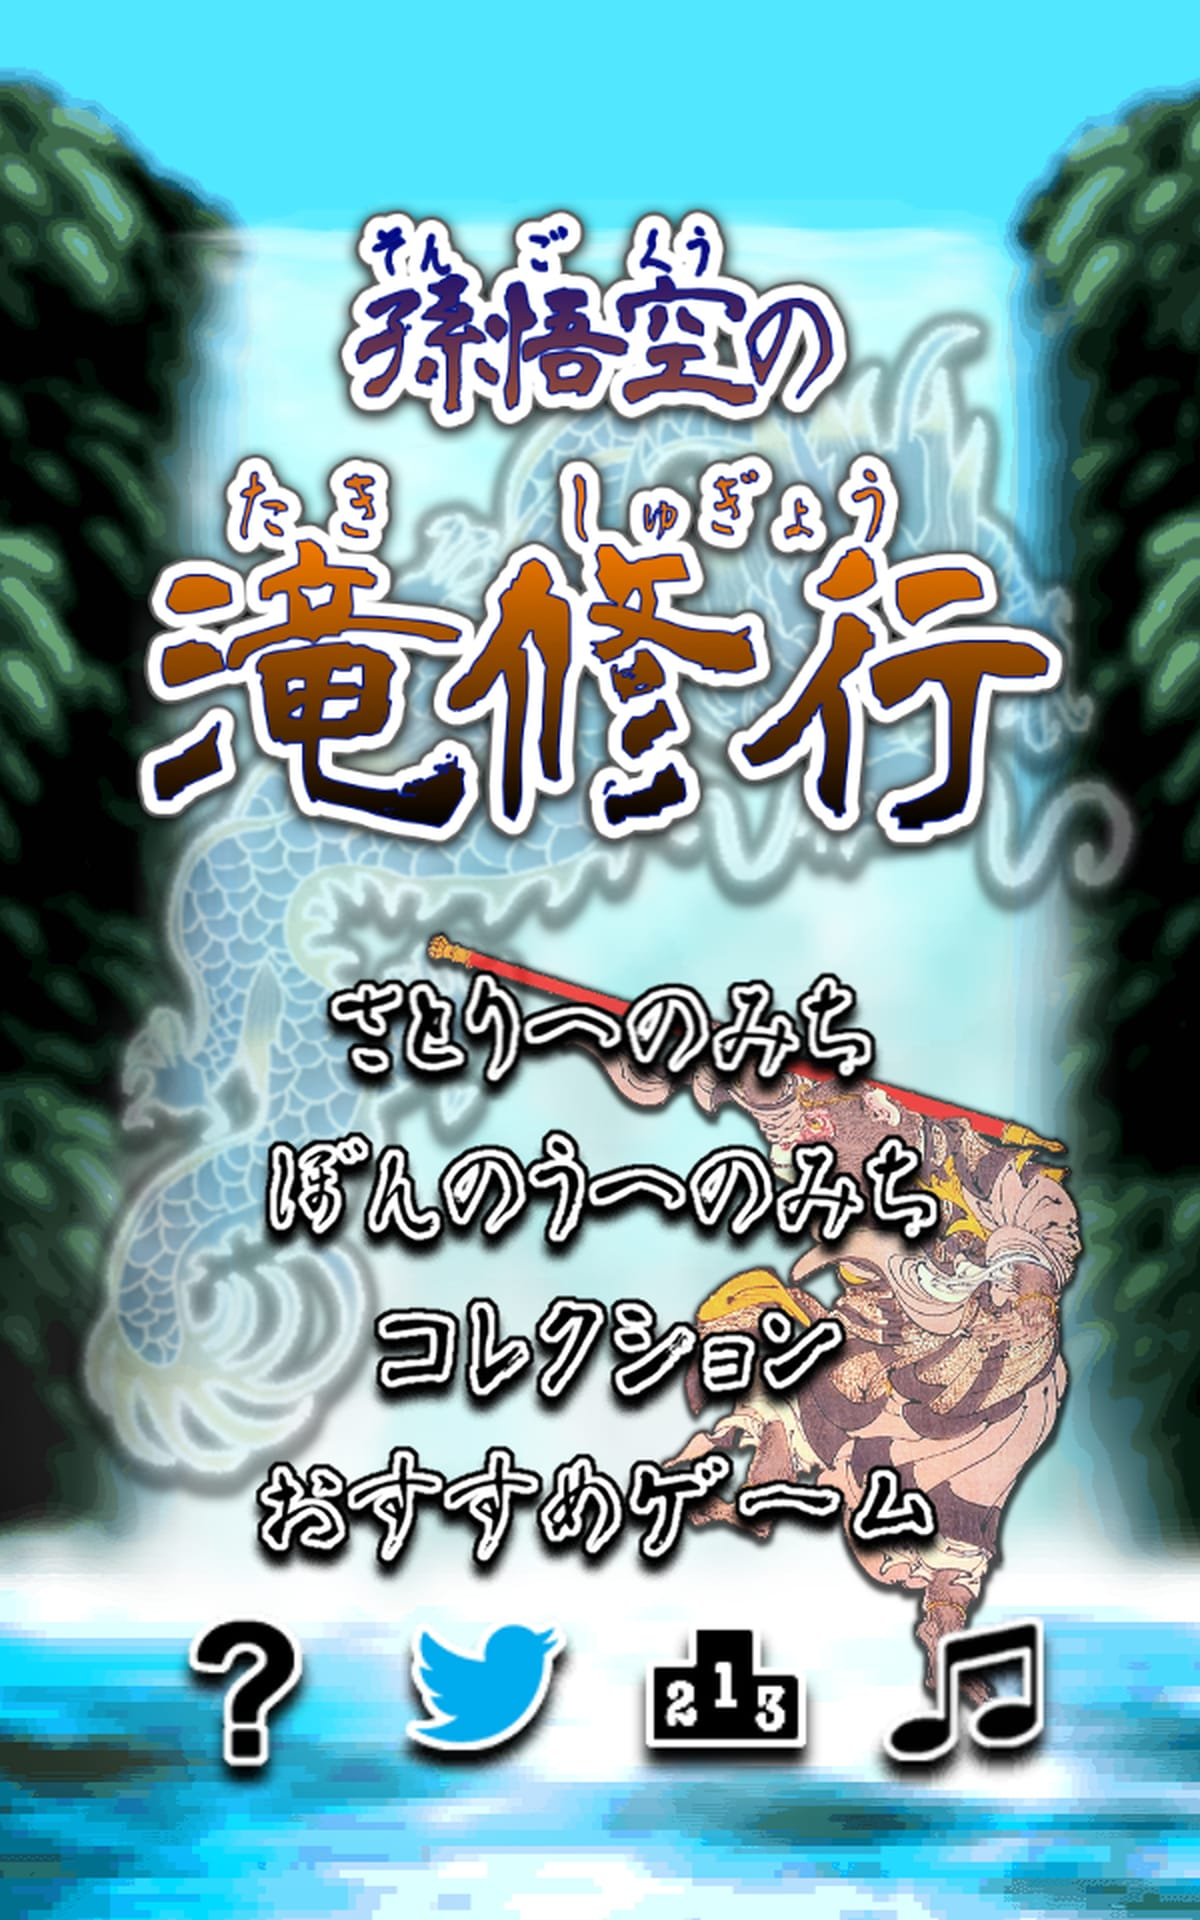 Waterfall Training of Goku